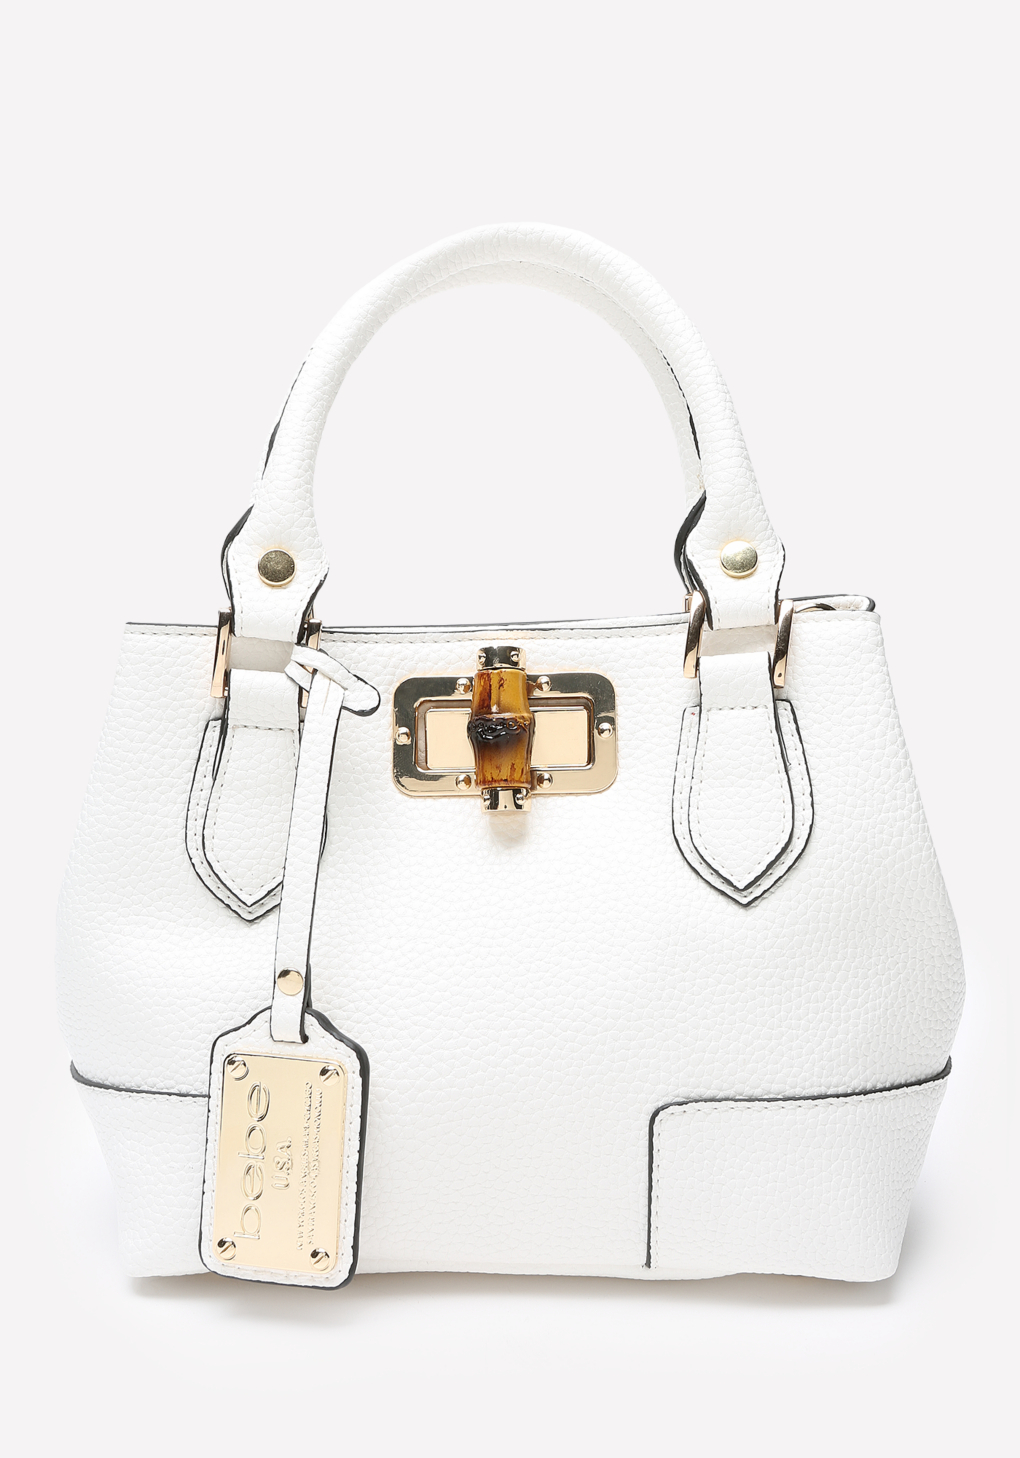 Bebe Jocelyn Crossbody Bag in White